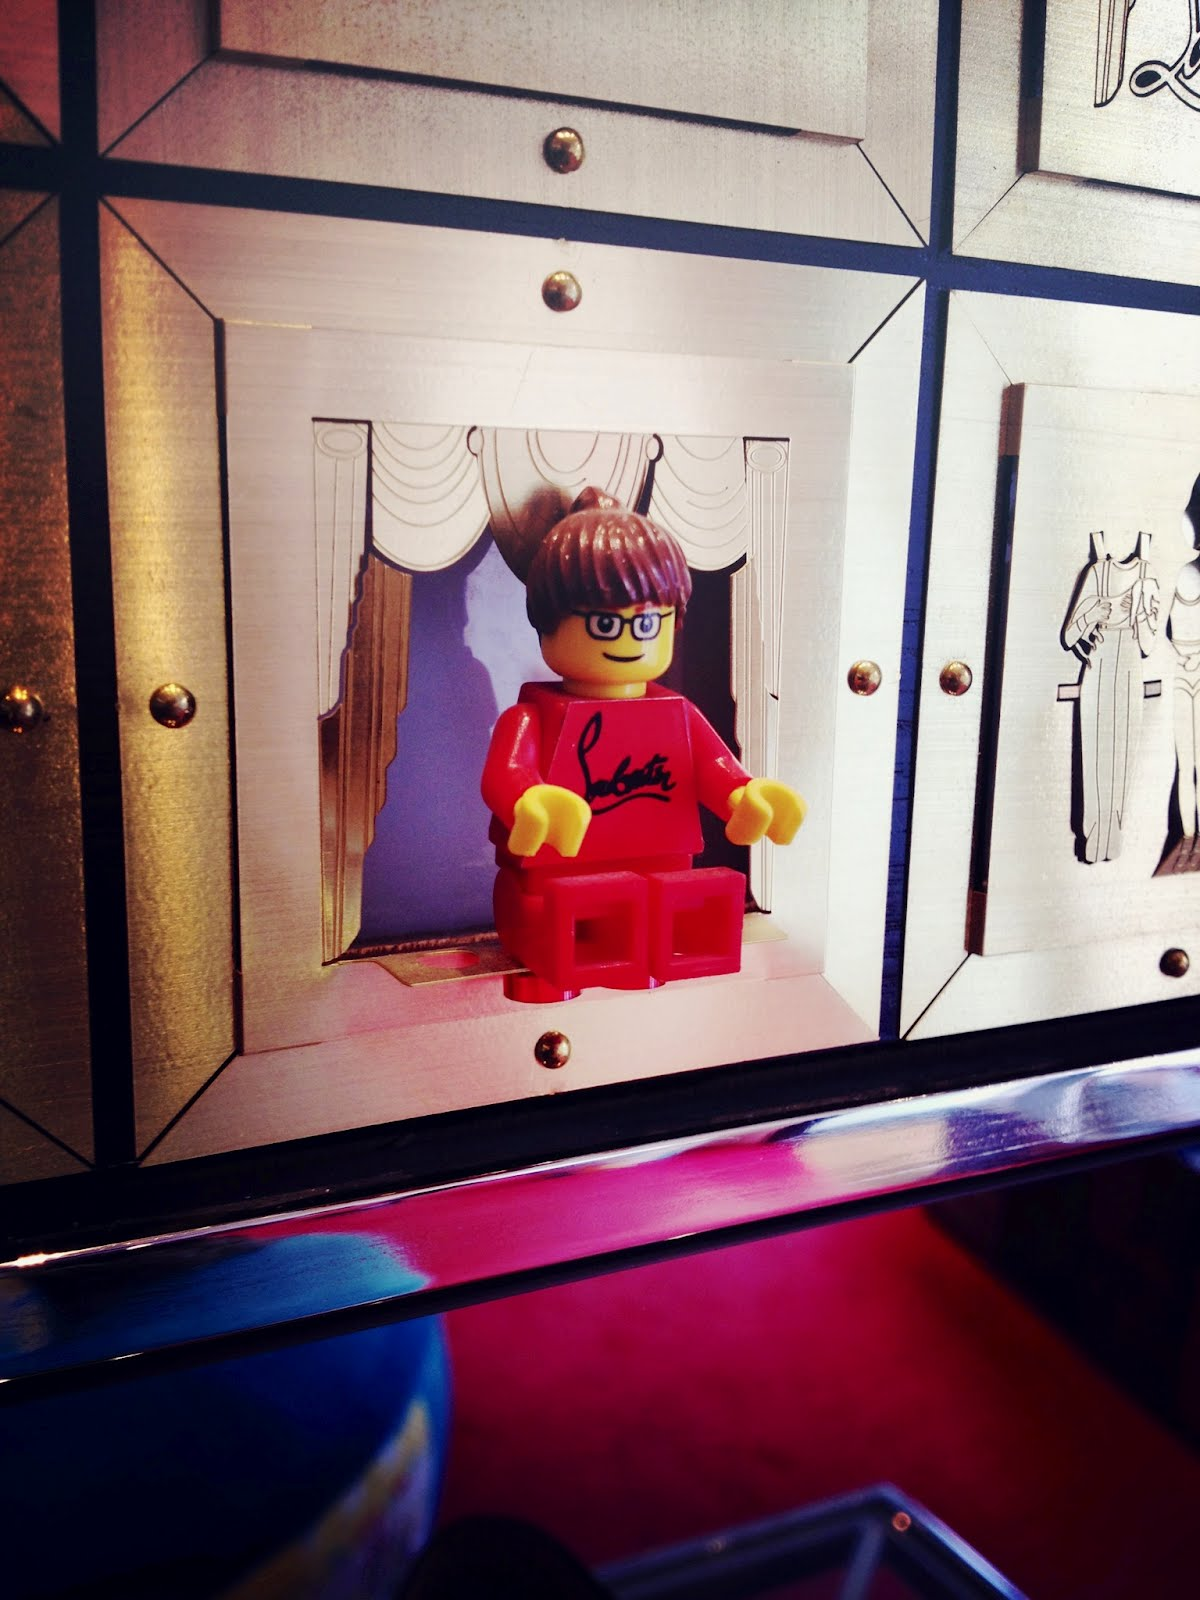 Christian Louboutin Copenhagen Lego 00o00 London Menswear Blog